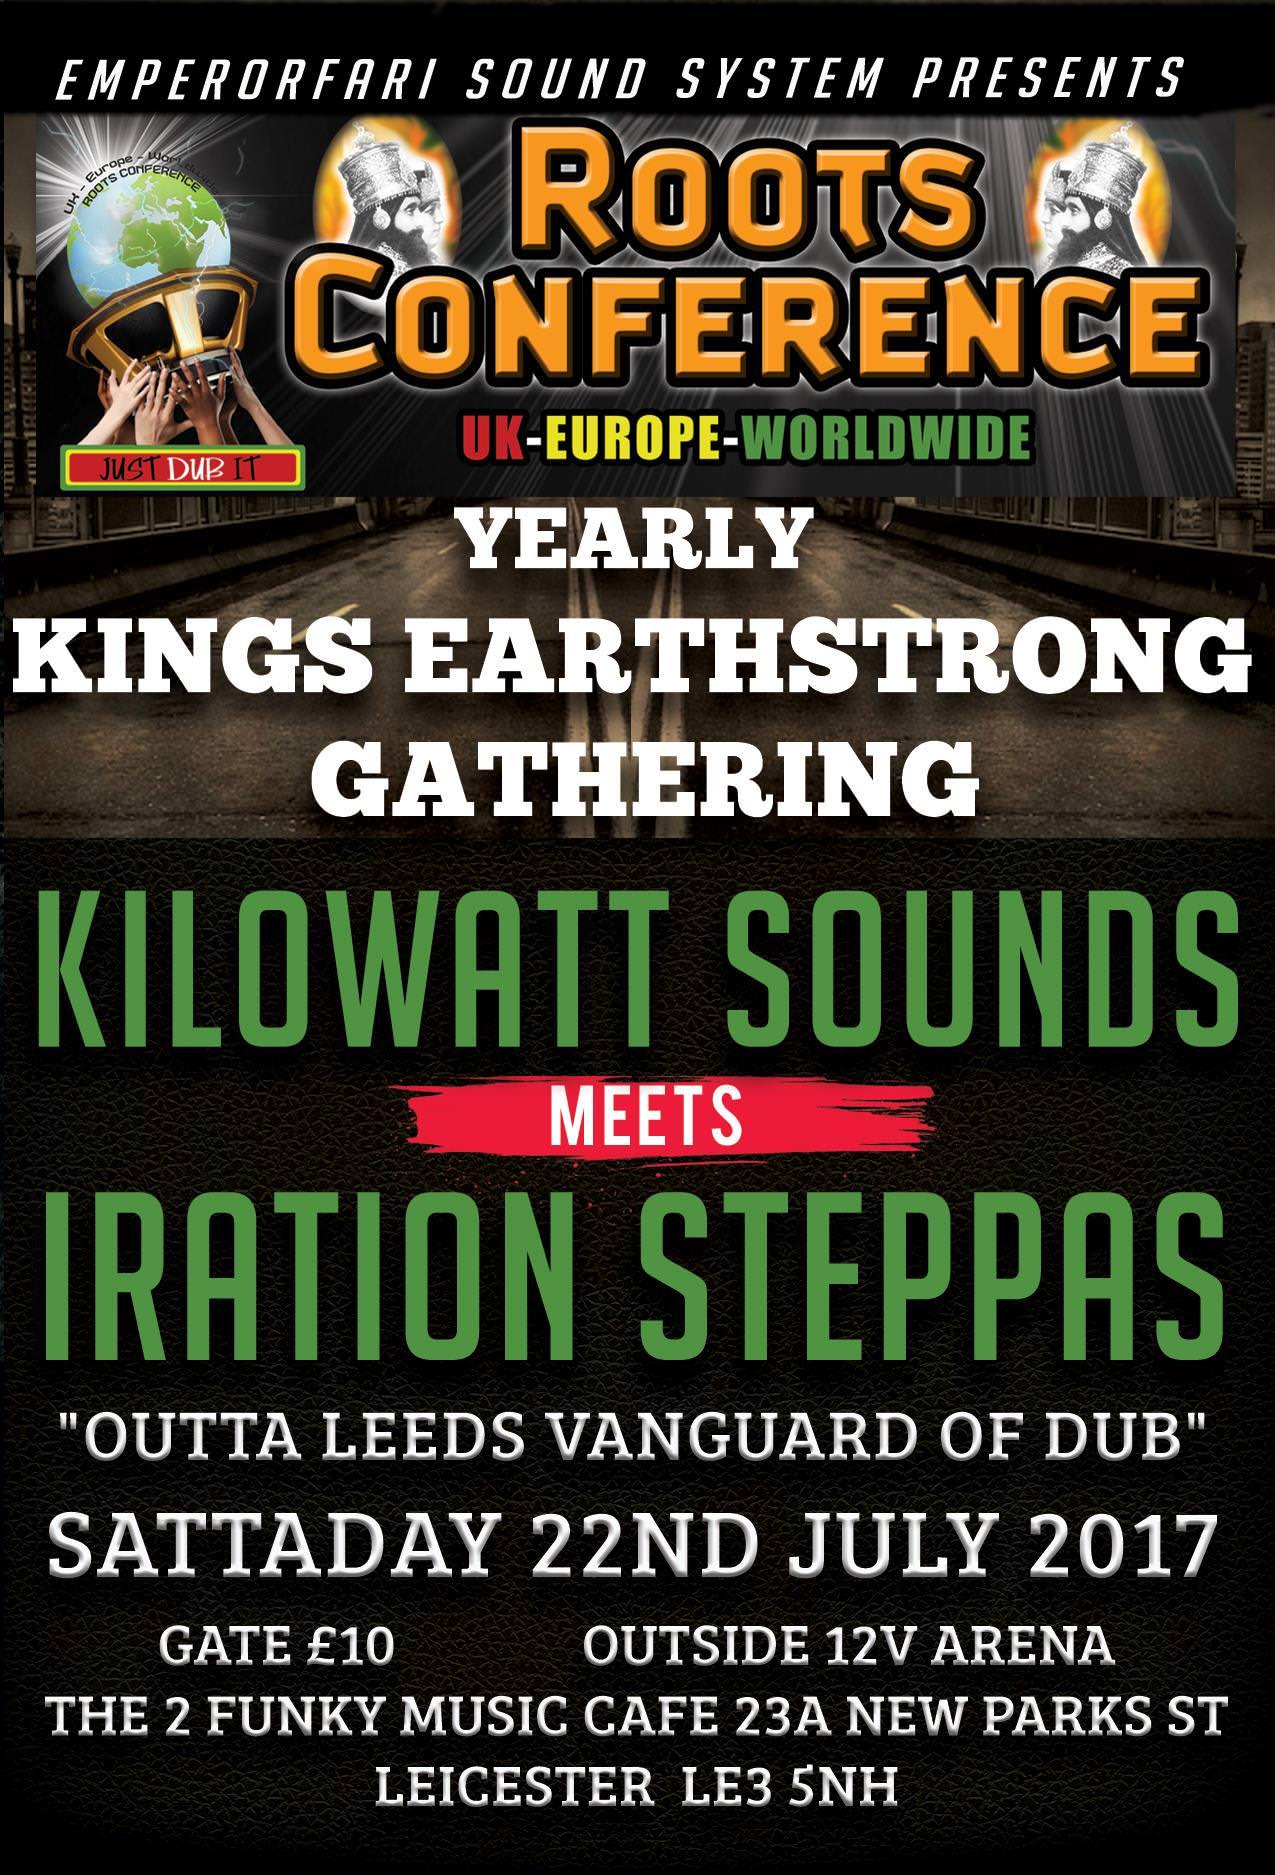 Iration Steppas mts Kilowatt Yearly Kings Earthstrong Gathering